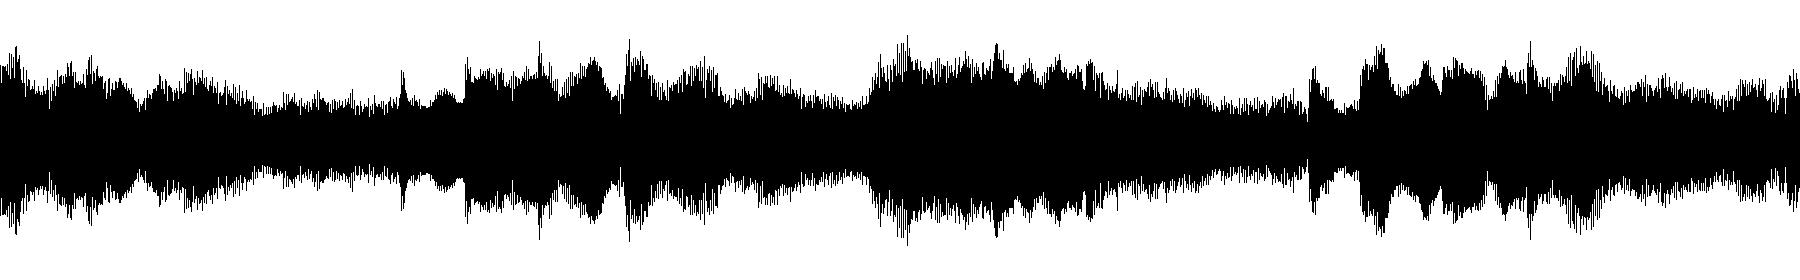 95 c ep stillsonice 03